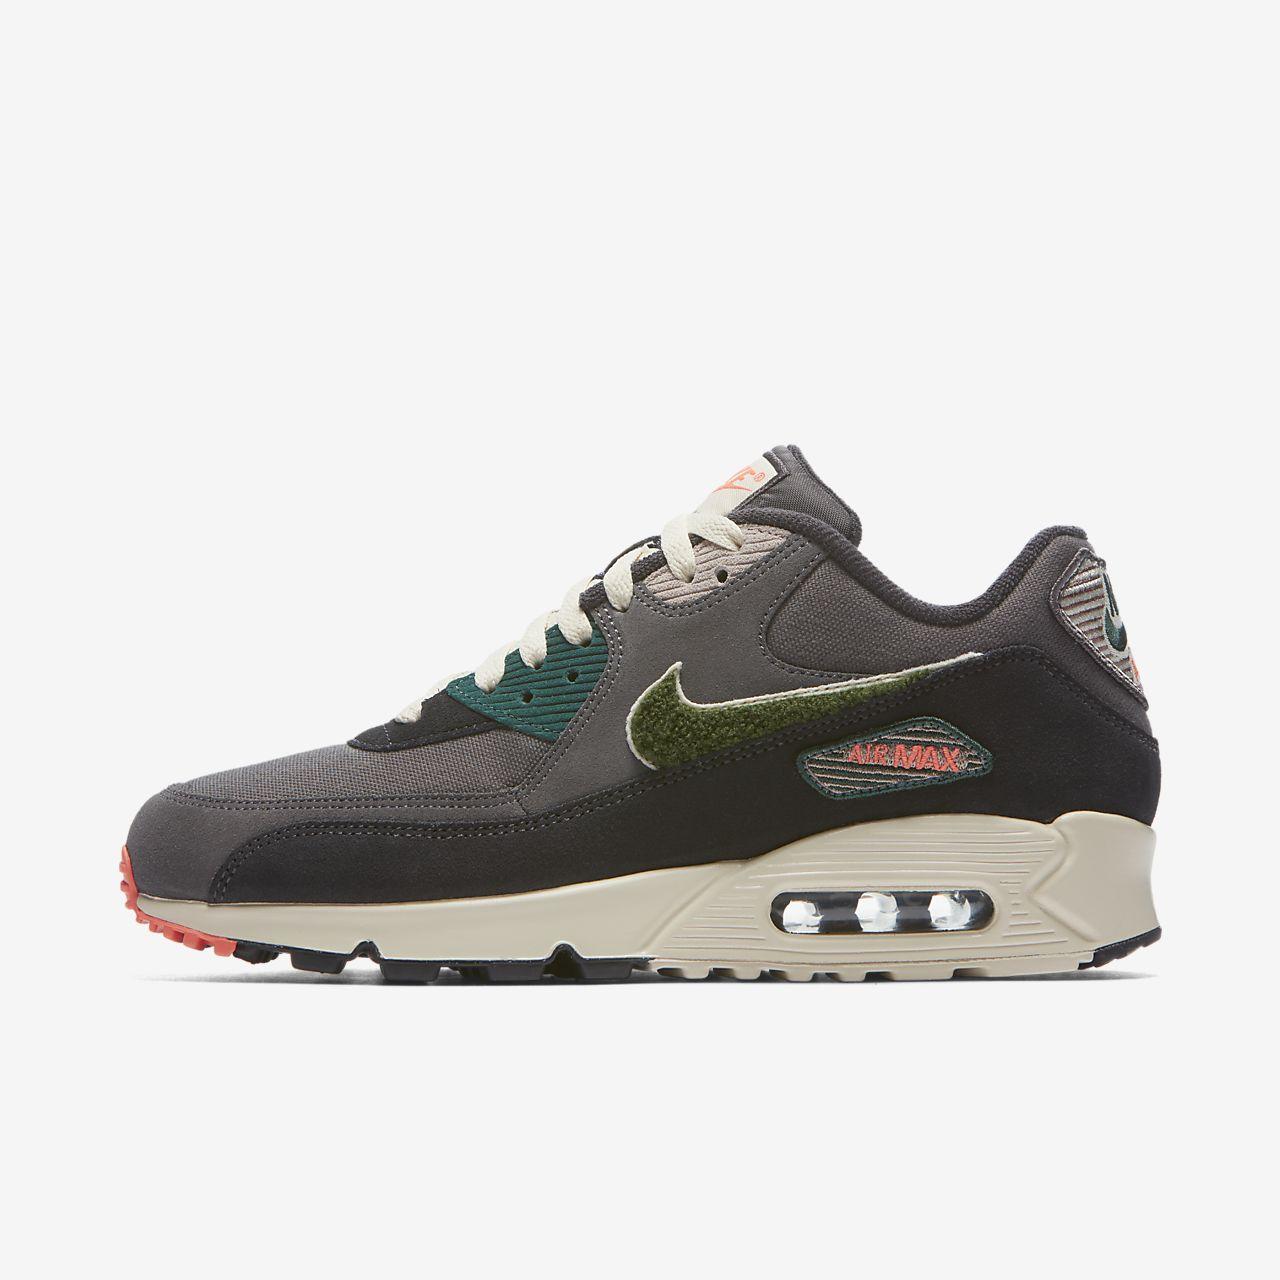 promo code 75a32 1be5b ... Nike Air Max 90 Premium SE - sko til mænd